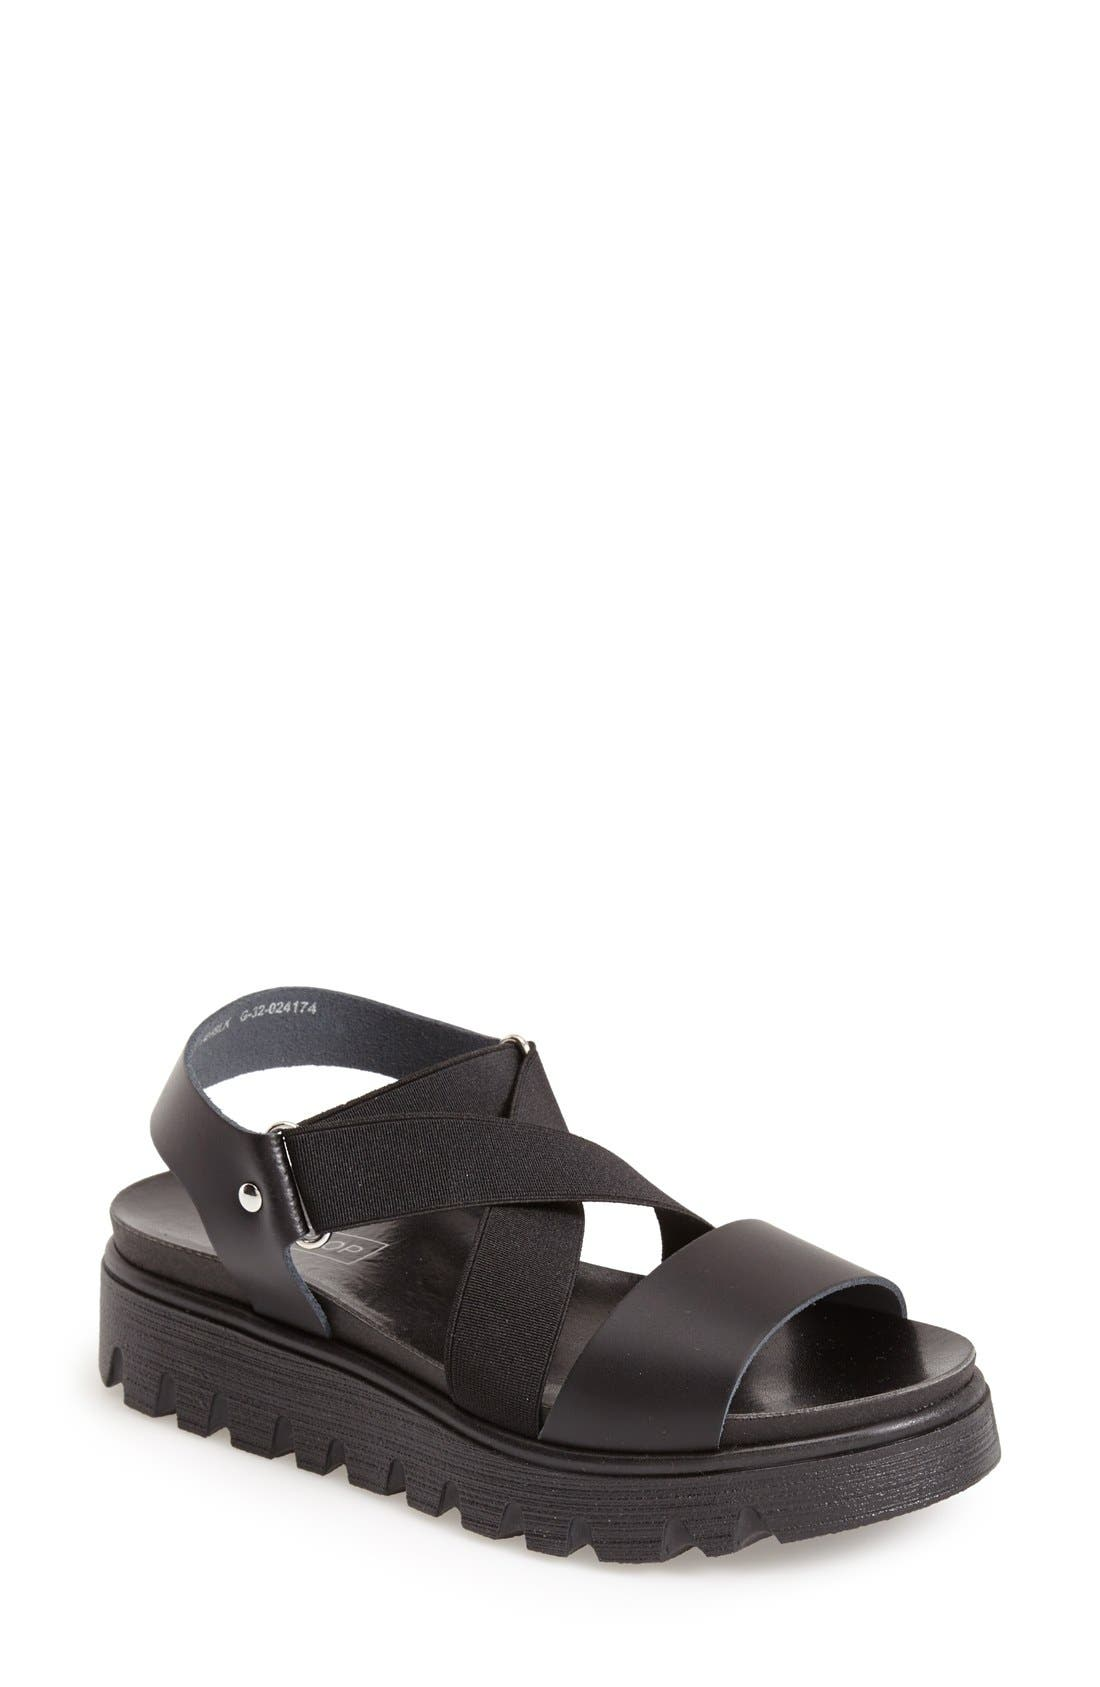 Main Image - Topshop 'Folly' Strappy Platform Sandal (Women)